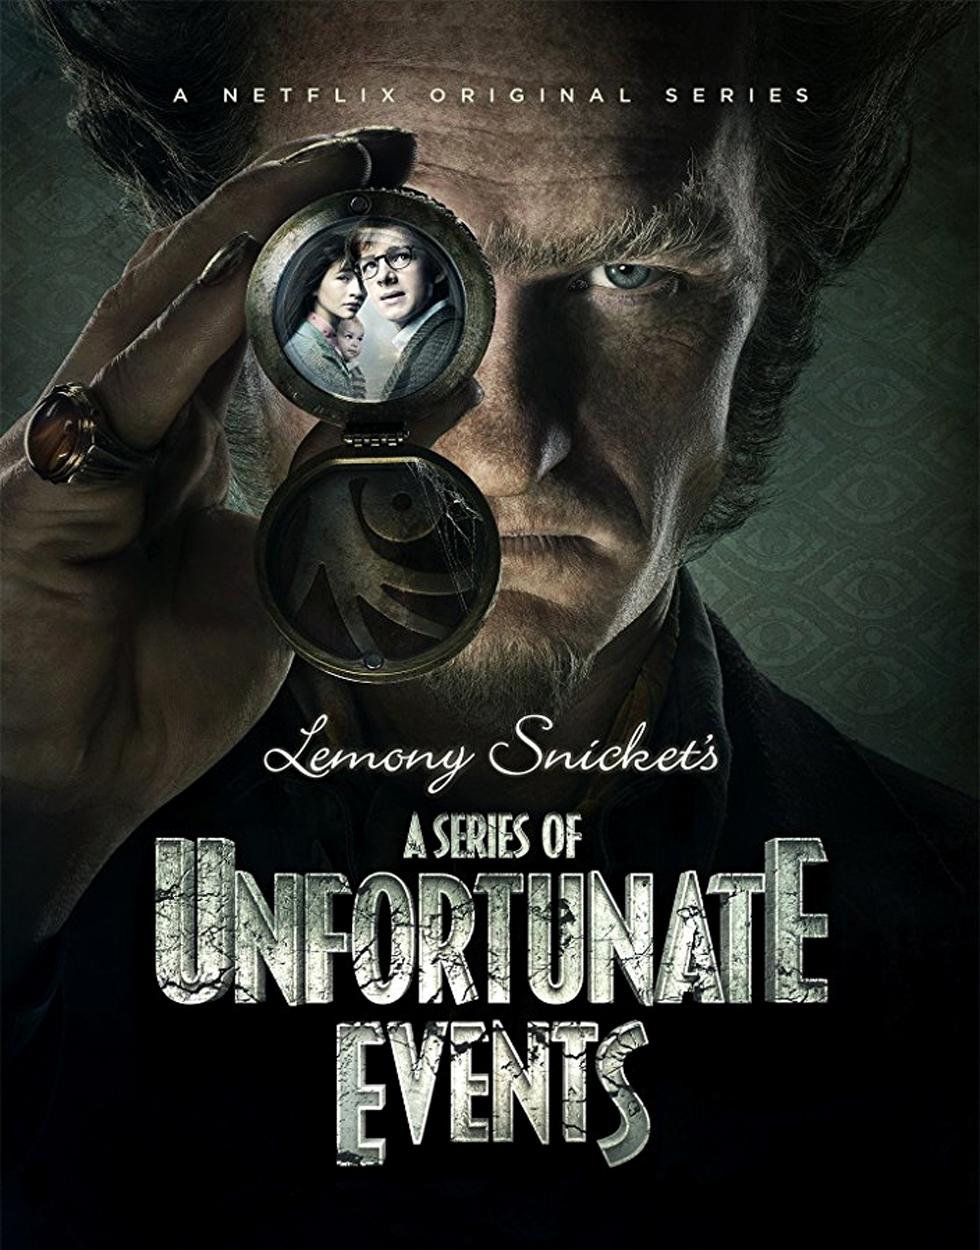 Series Of Unfortunate Events.jpg